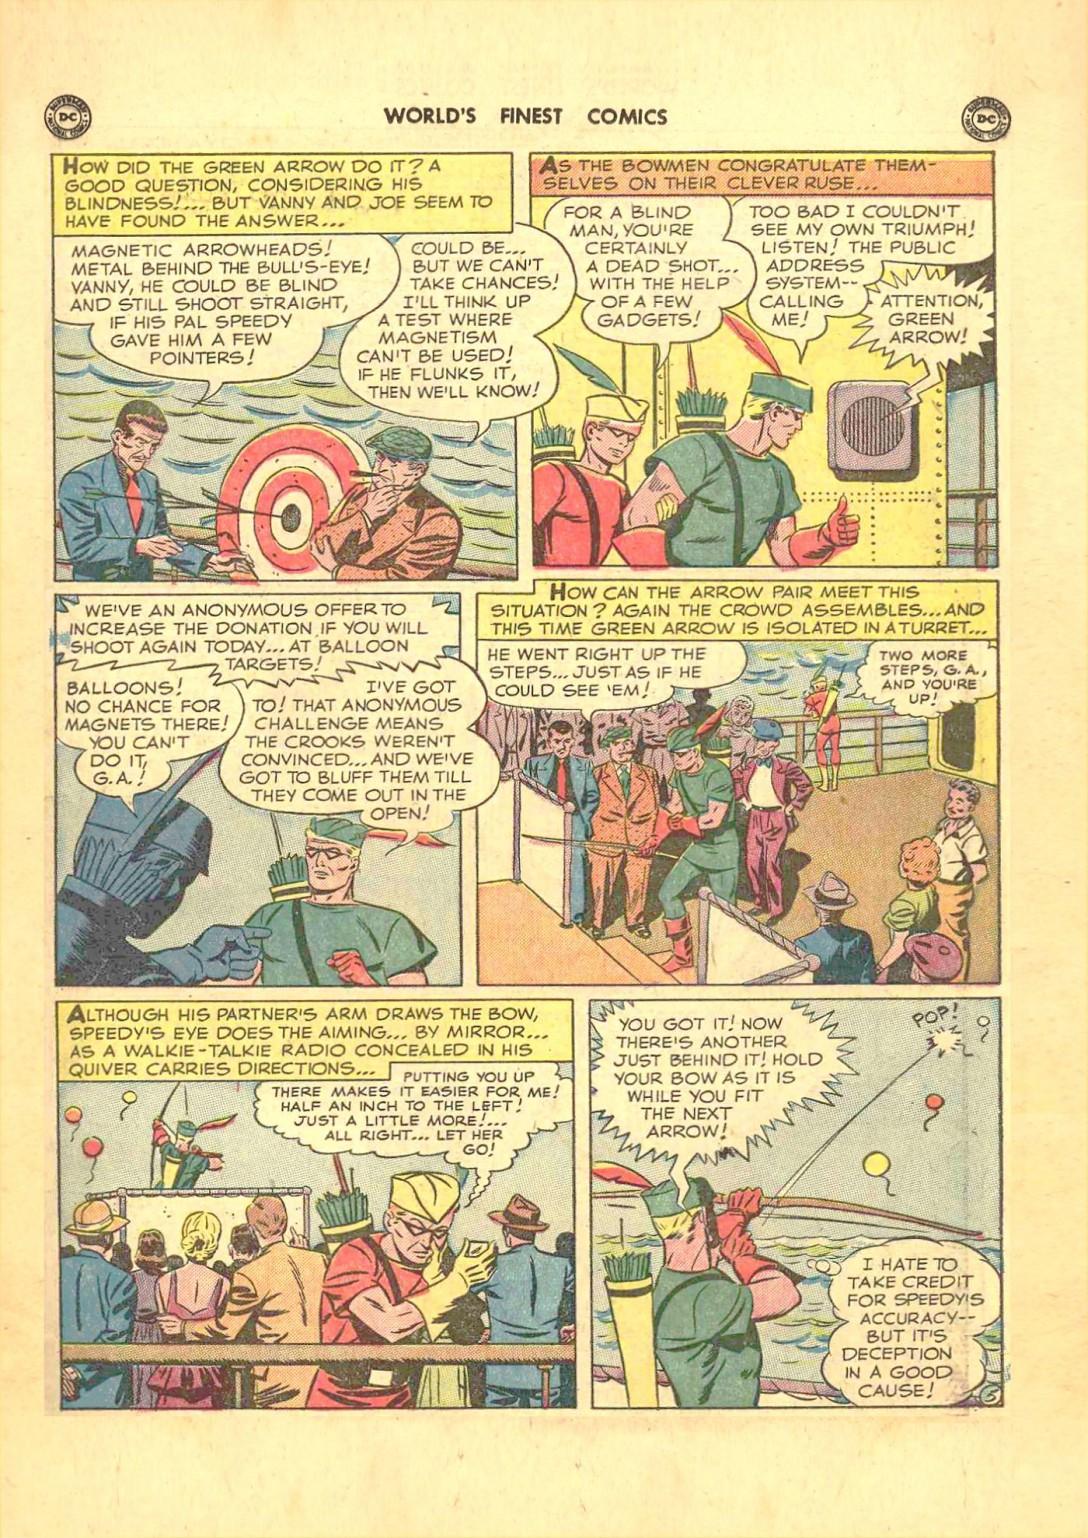 Read online World's Finest Comics comic -  Issue #50 - 21